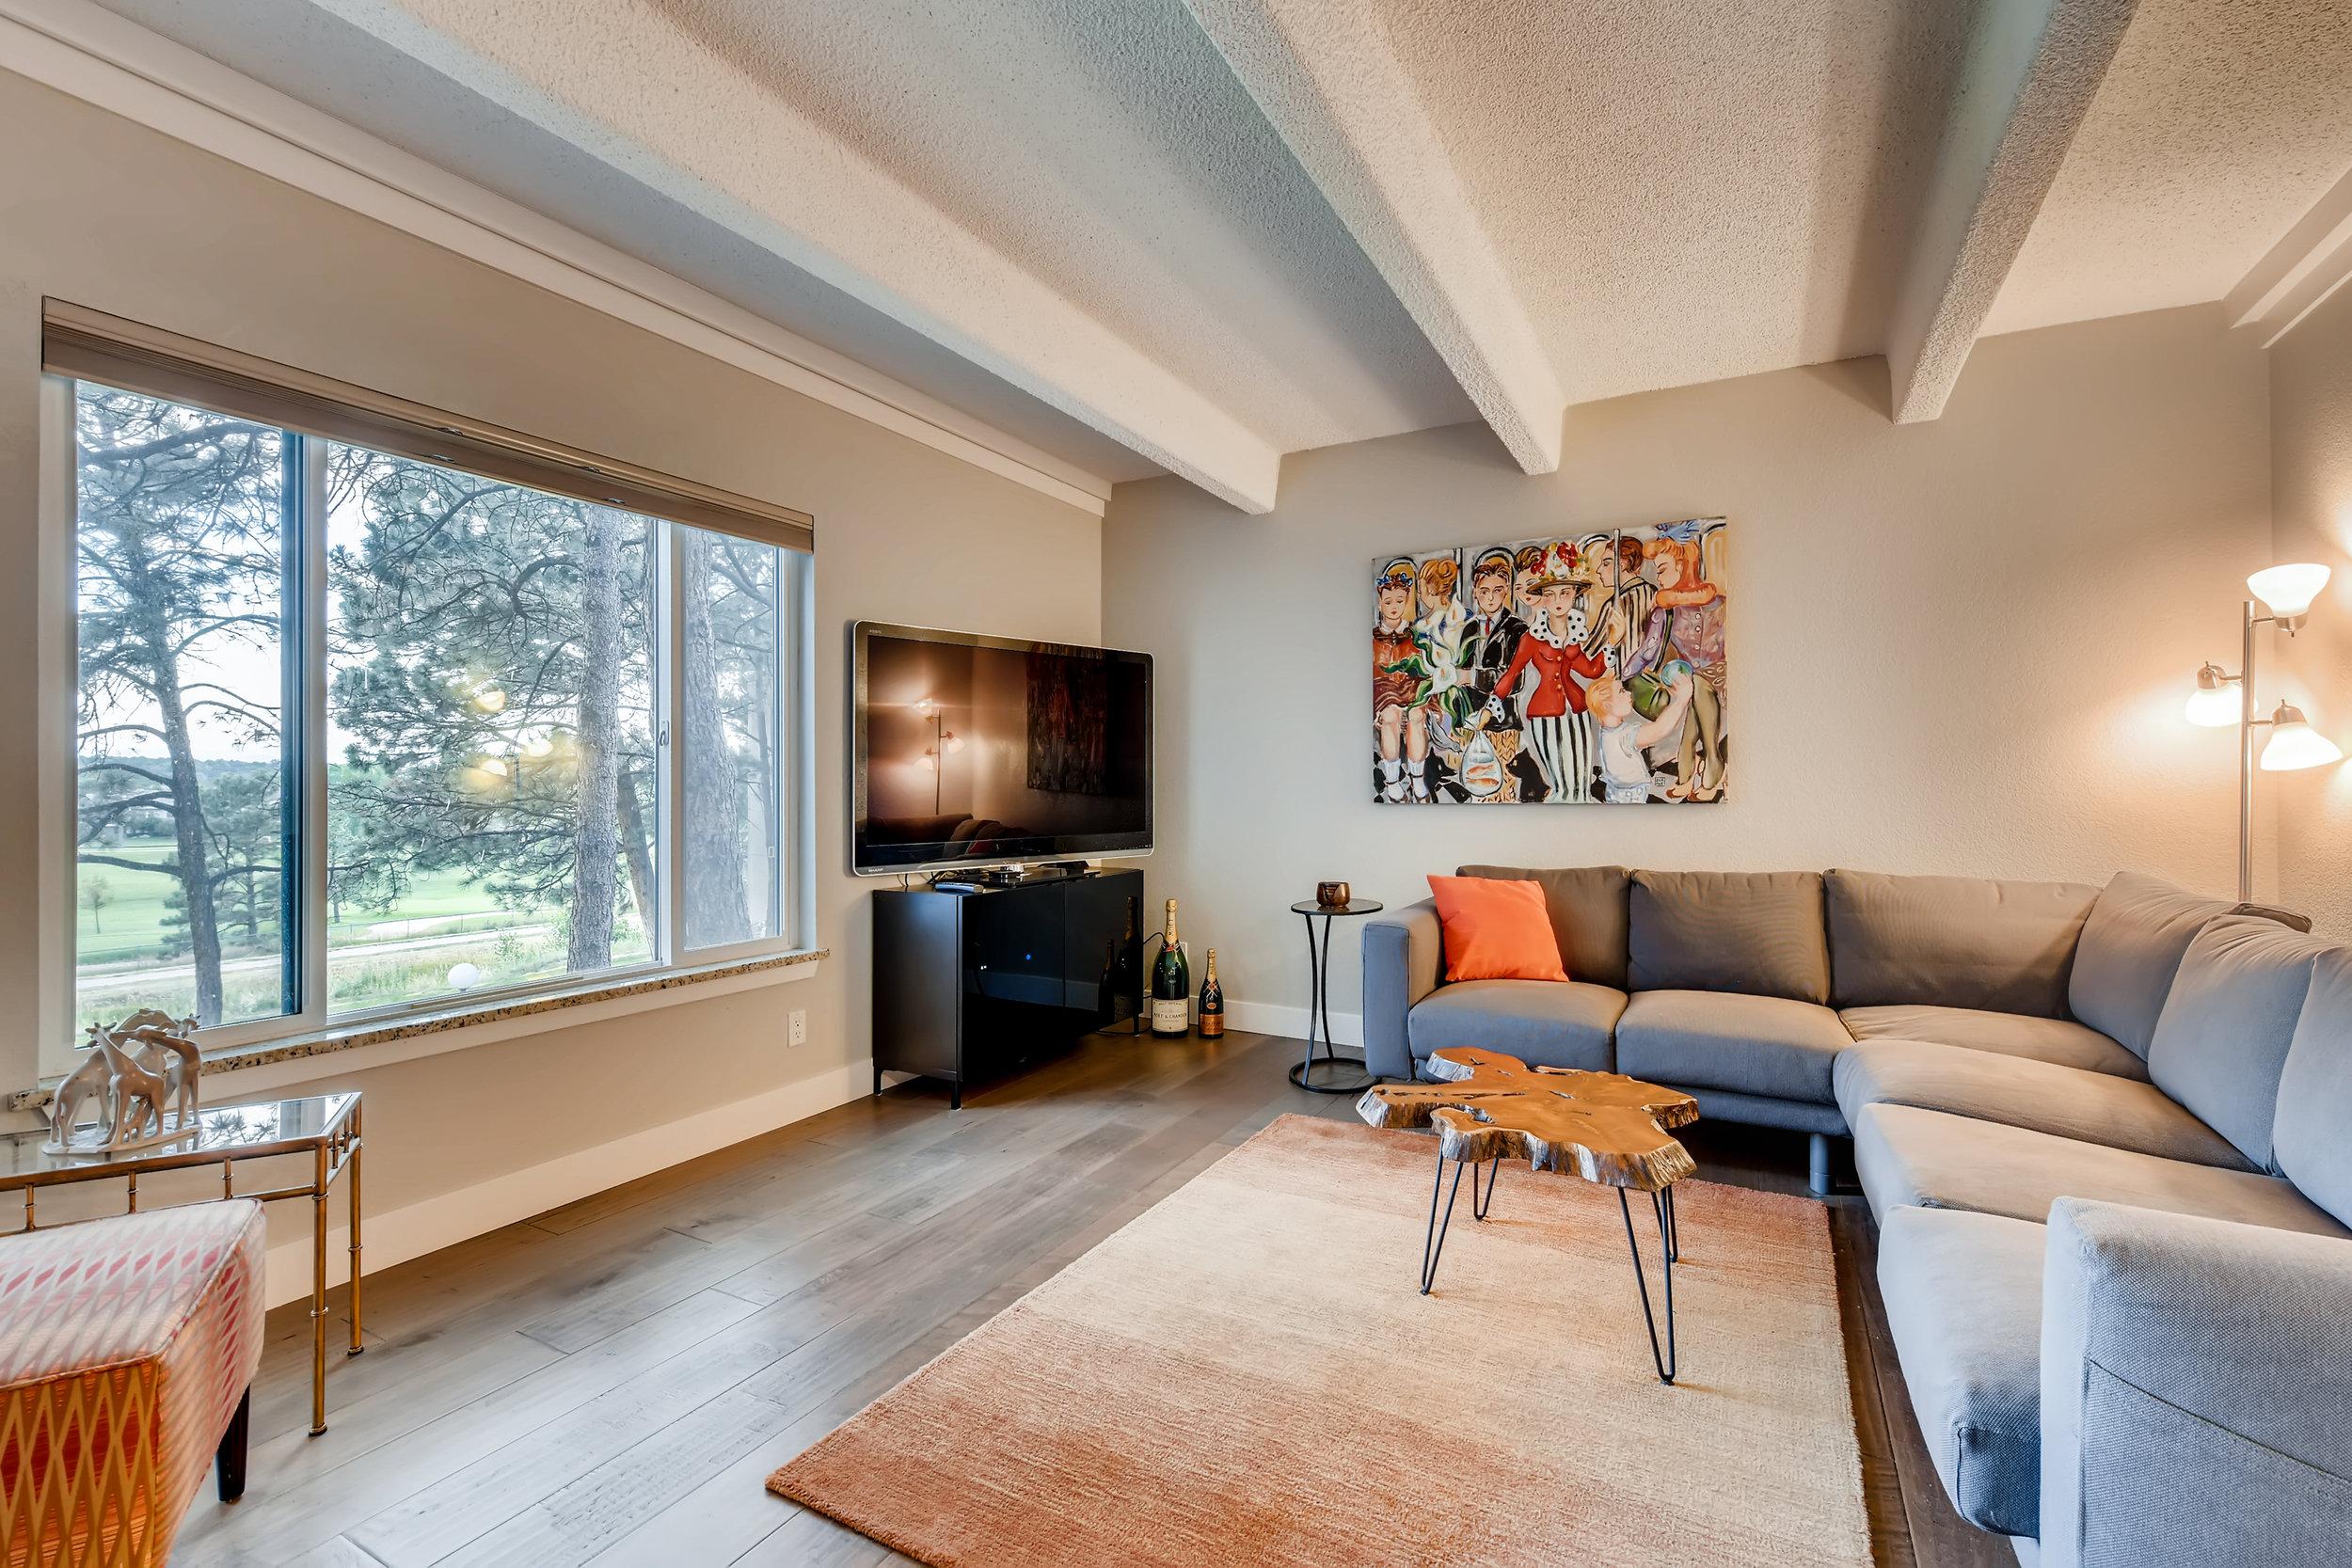 2525 S Deyton Way Unit 1107-print-009-017-Living Room-3600x2400-300dpi.jpg